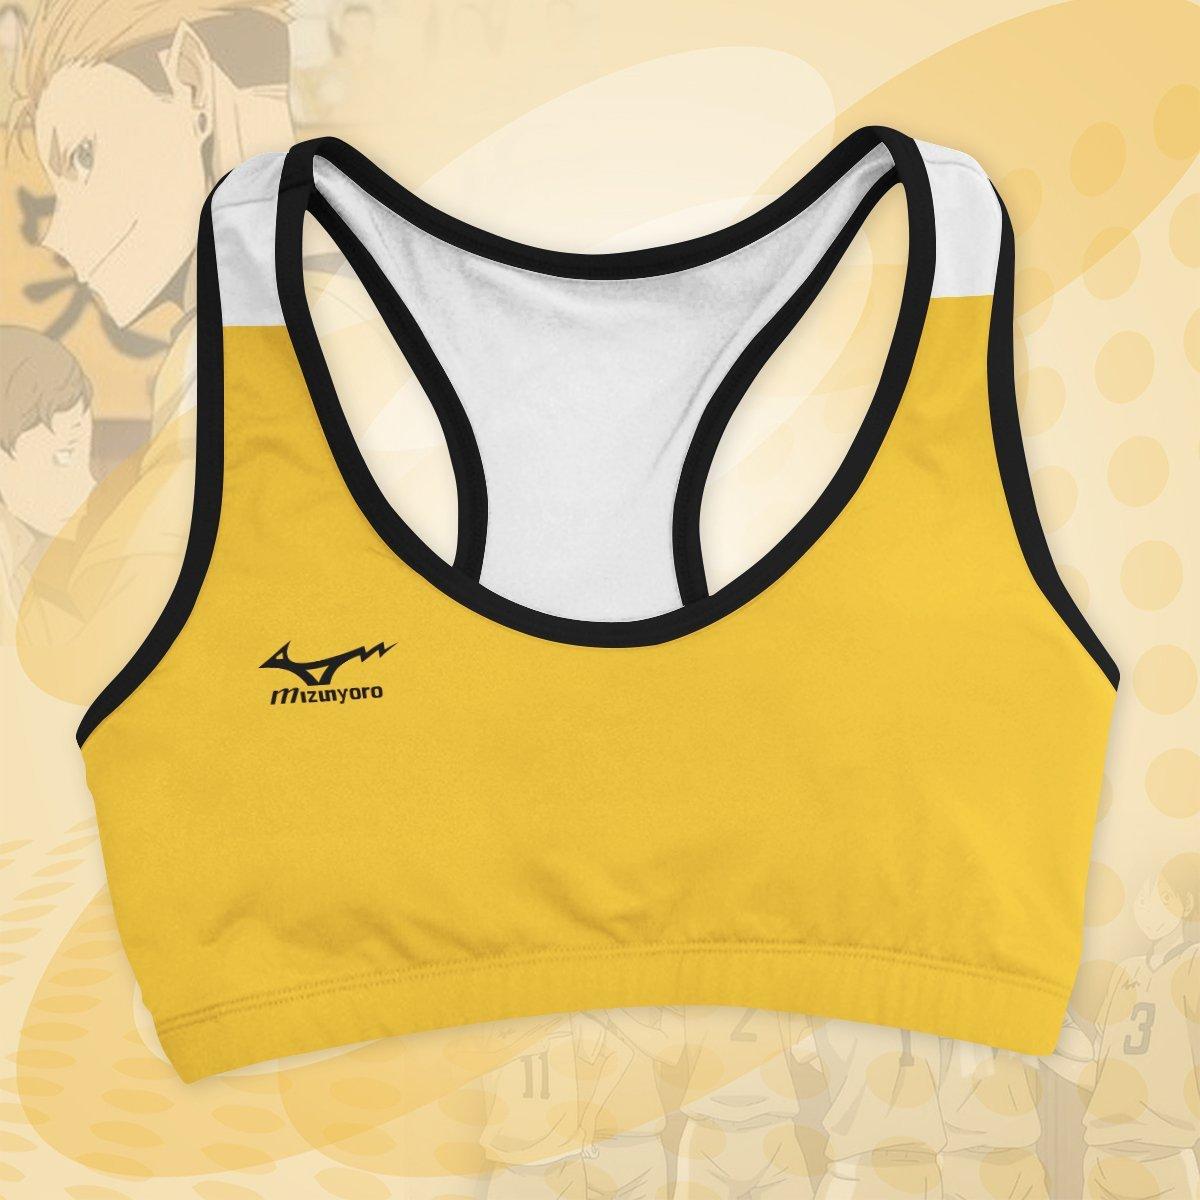 team johzenji active wear set 569201 - Anime Swimsuits